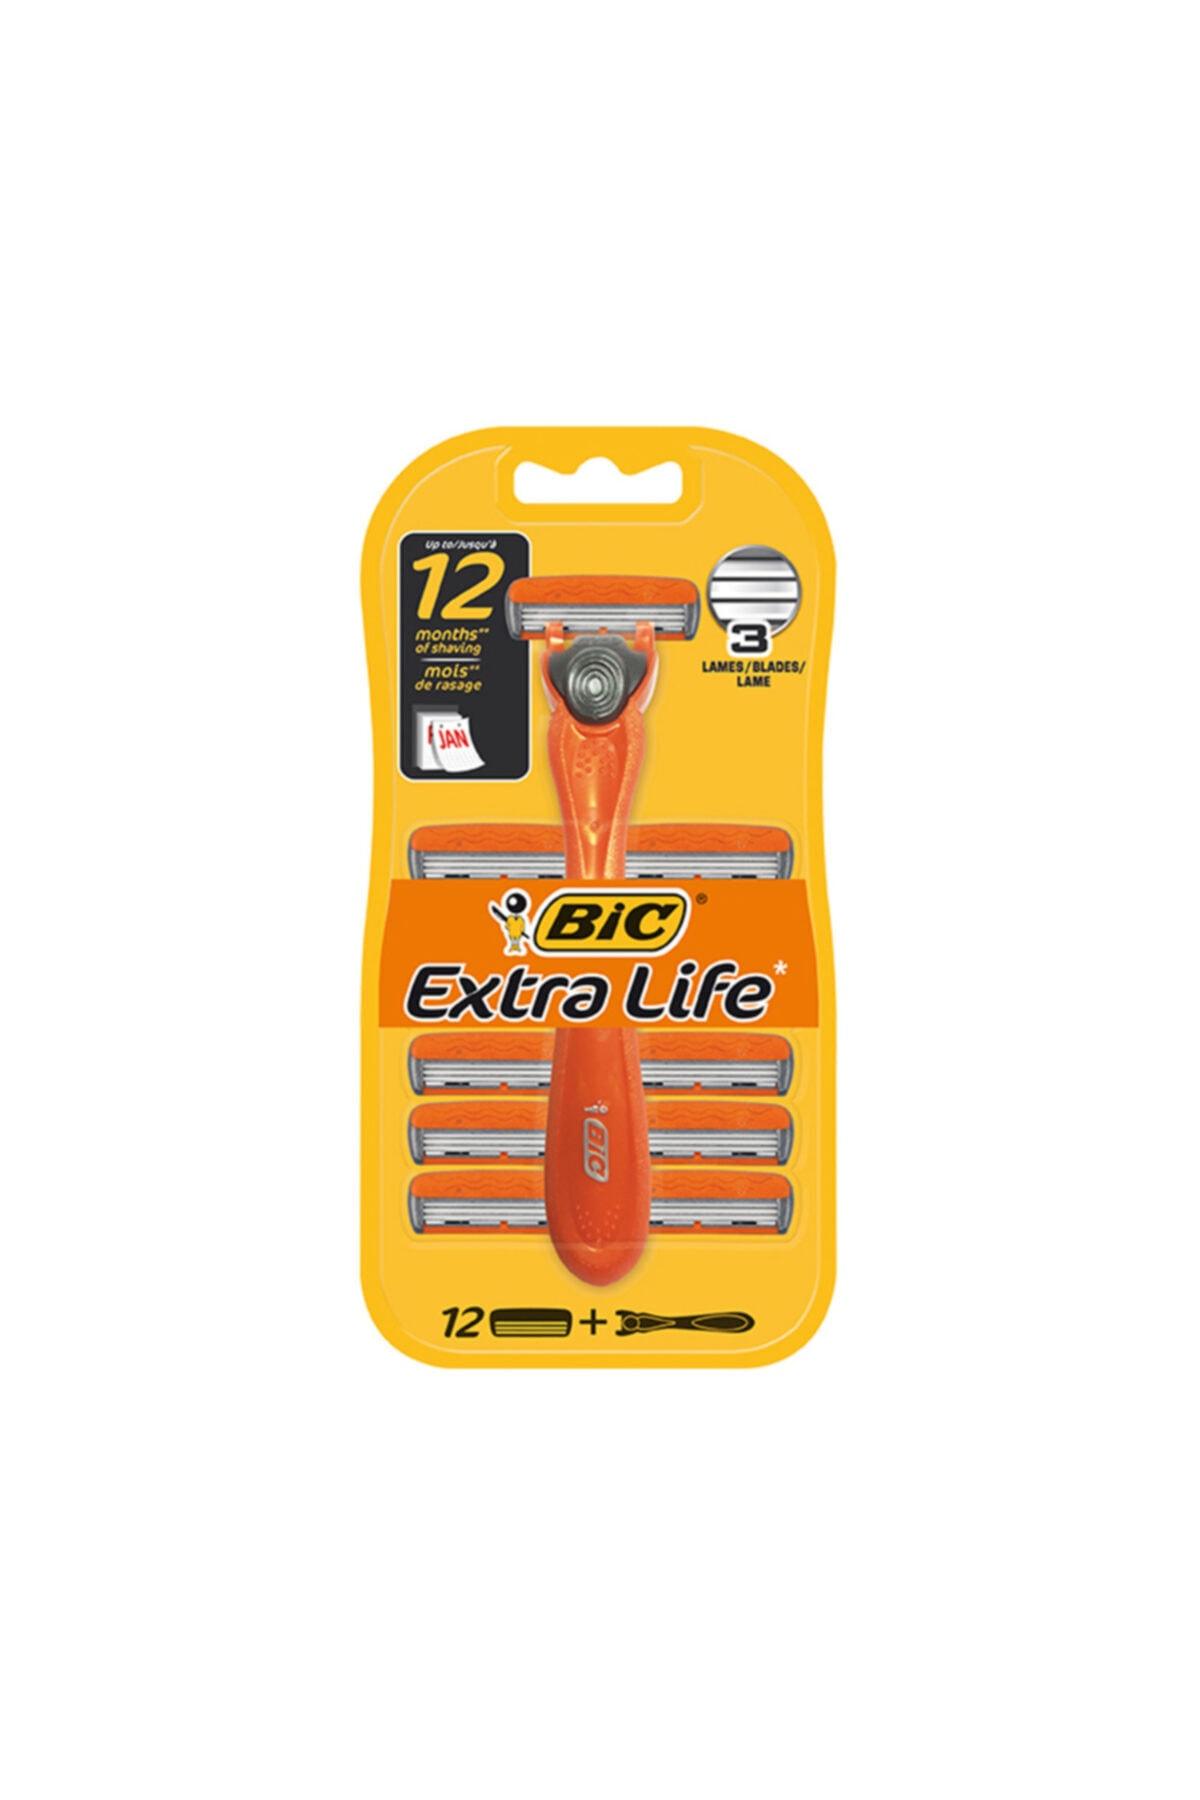 Bic Bıc 3 Hybrid Extra Life Tıraş Bıçağı 12 Kartuşlu 1